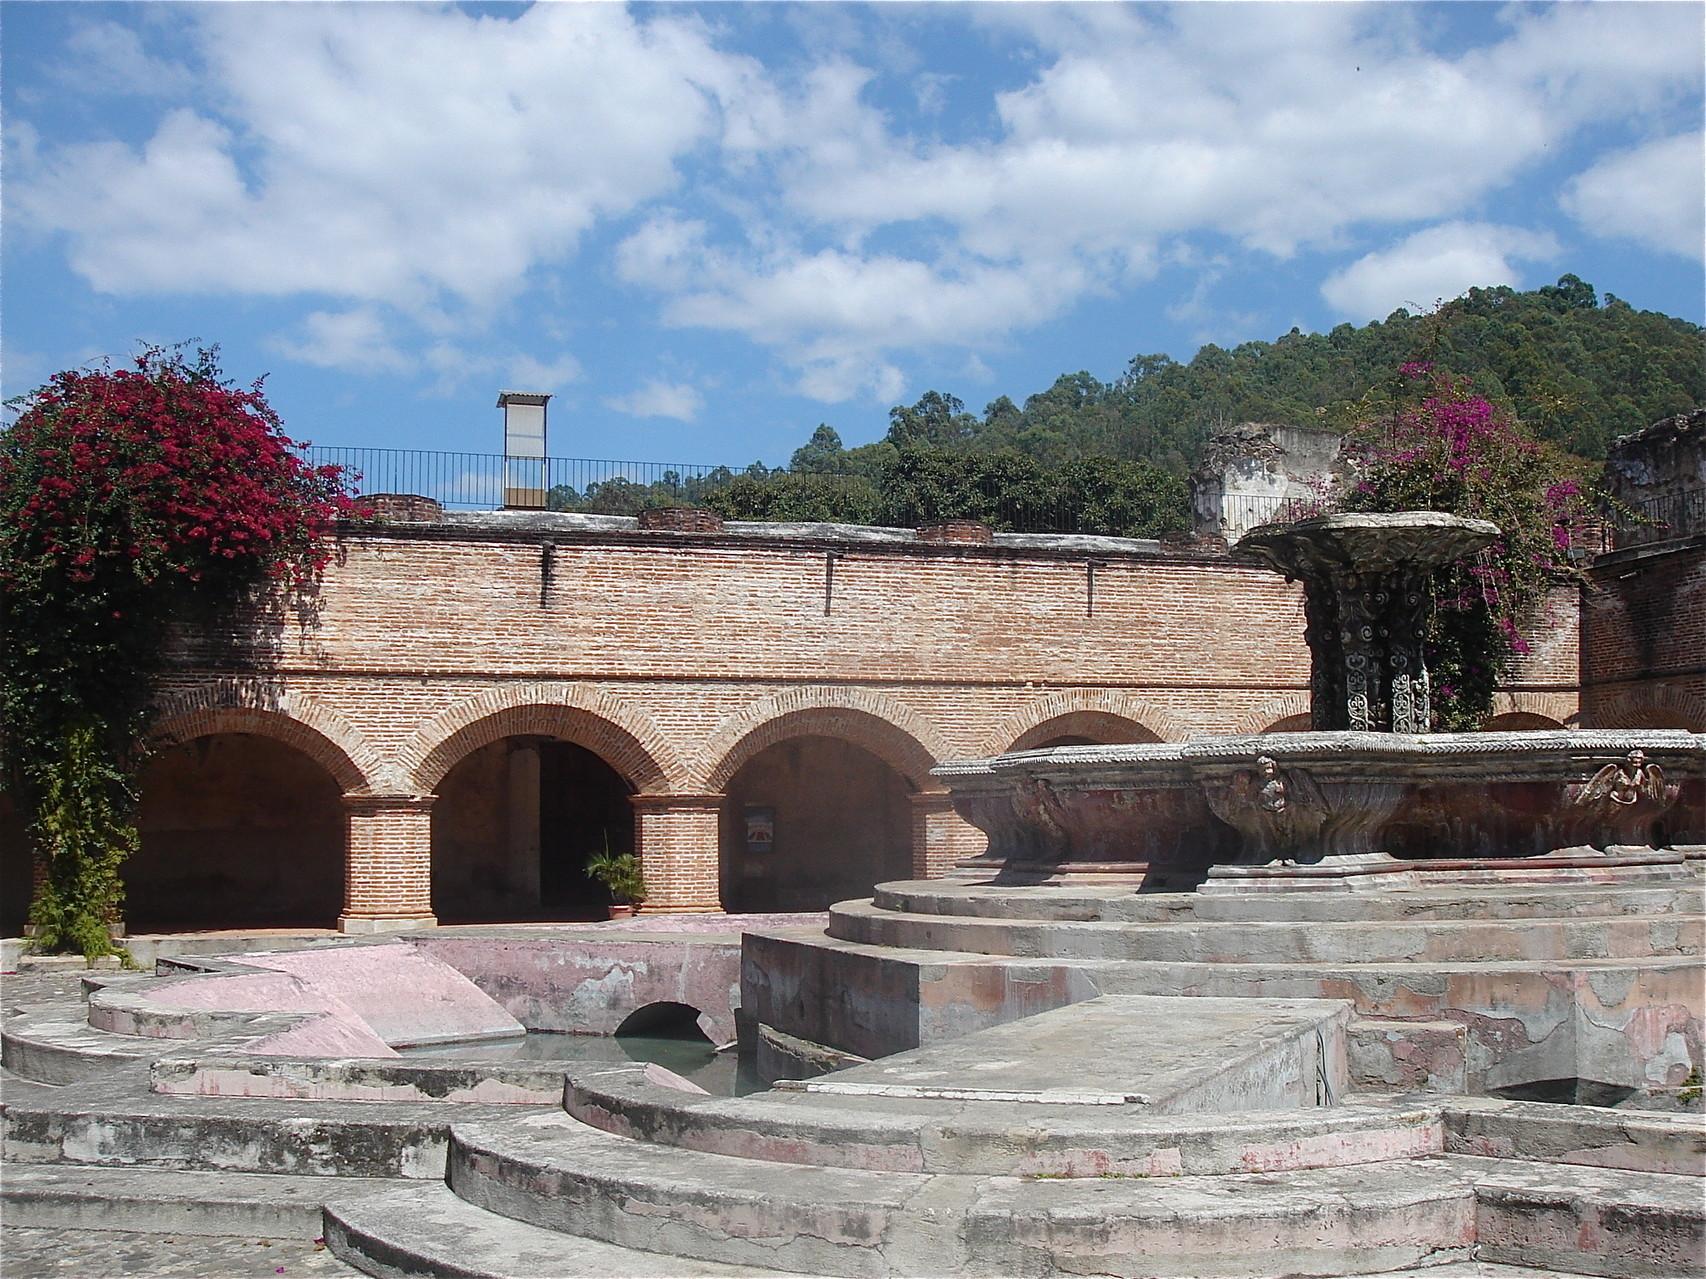 Church and convent of Nuestra Señora de la Merced